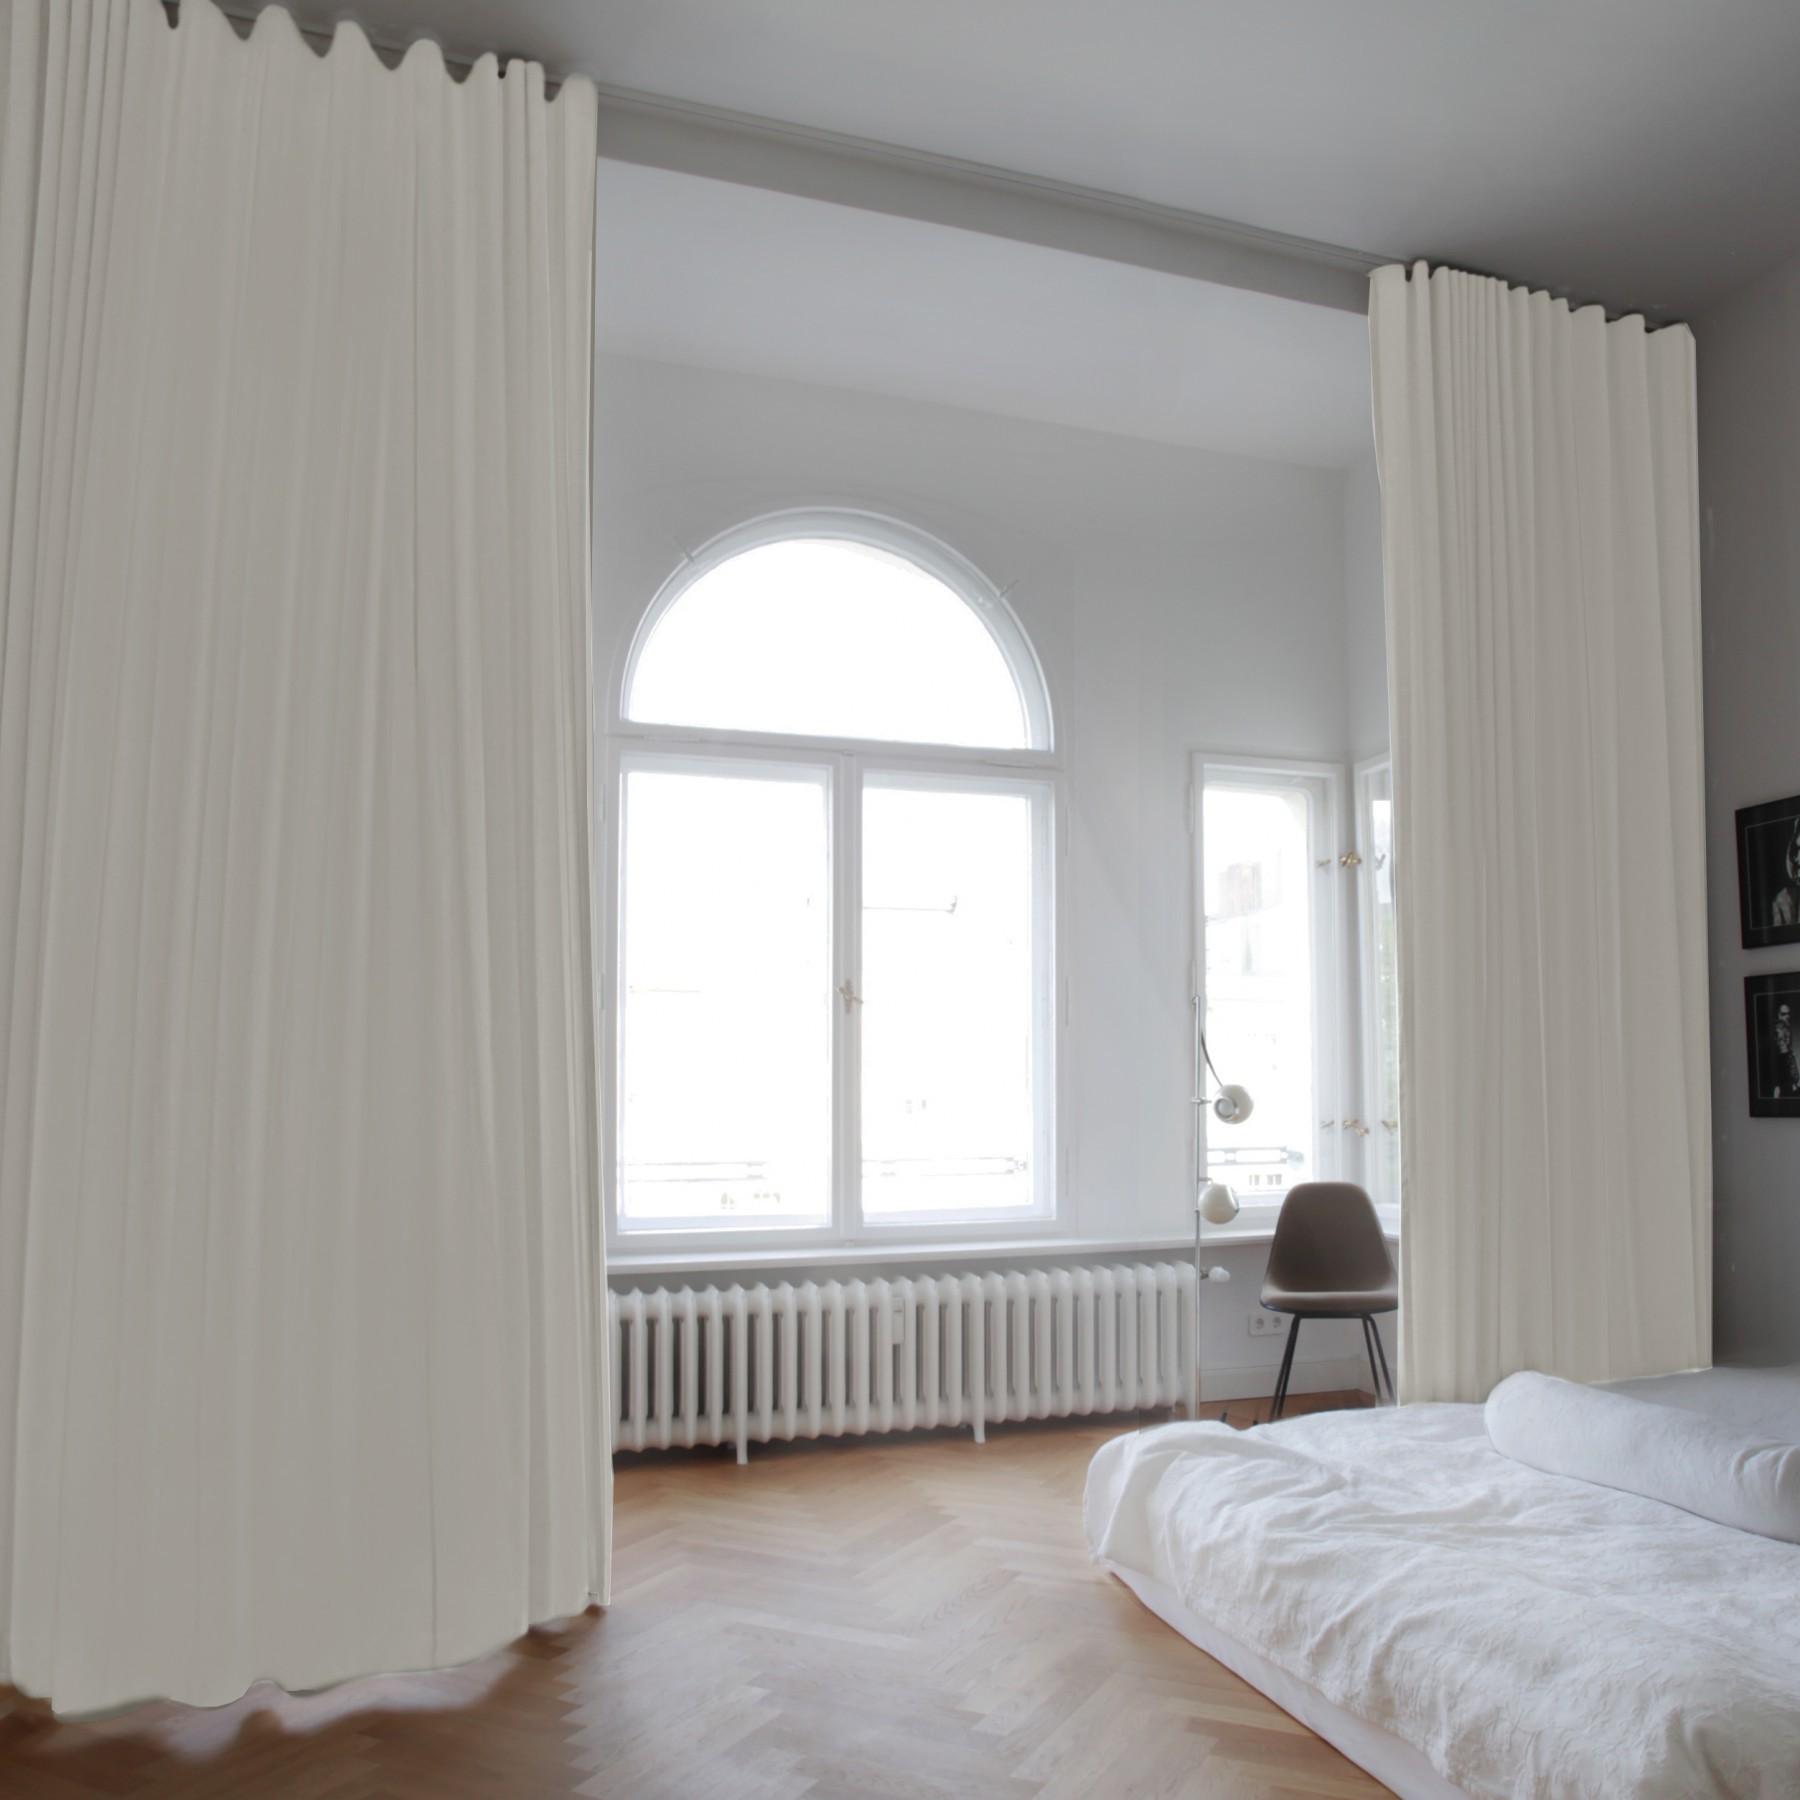 vorhang shop gardinen wohnzimmer mit vorhang shop best of wohnzimmer gardine nach ma mit balkon. Black Bedroom Furniture Sets. Home Design Ideas